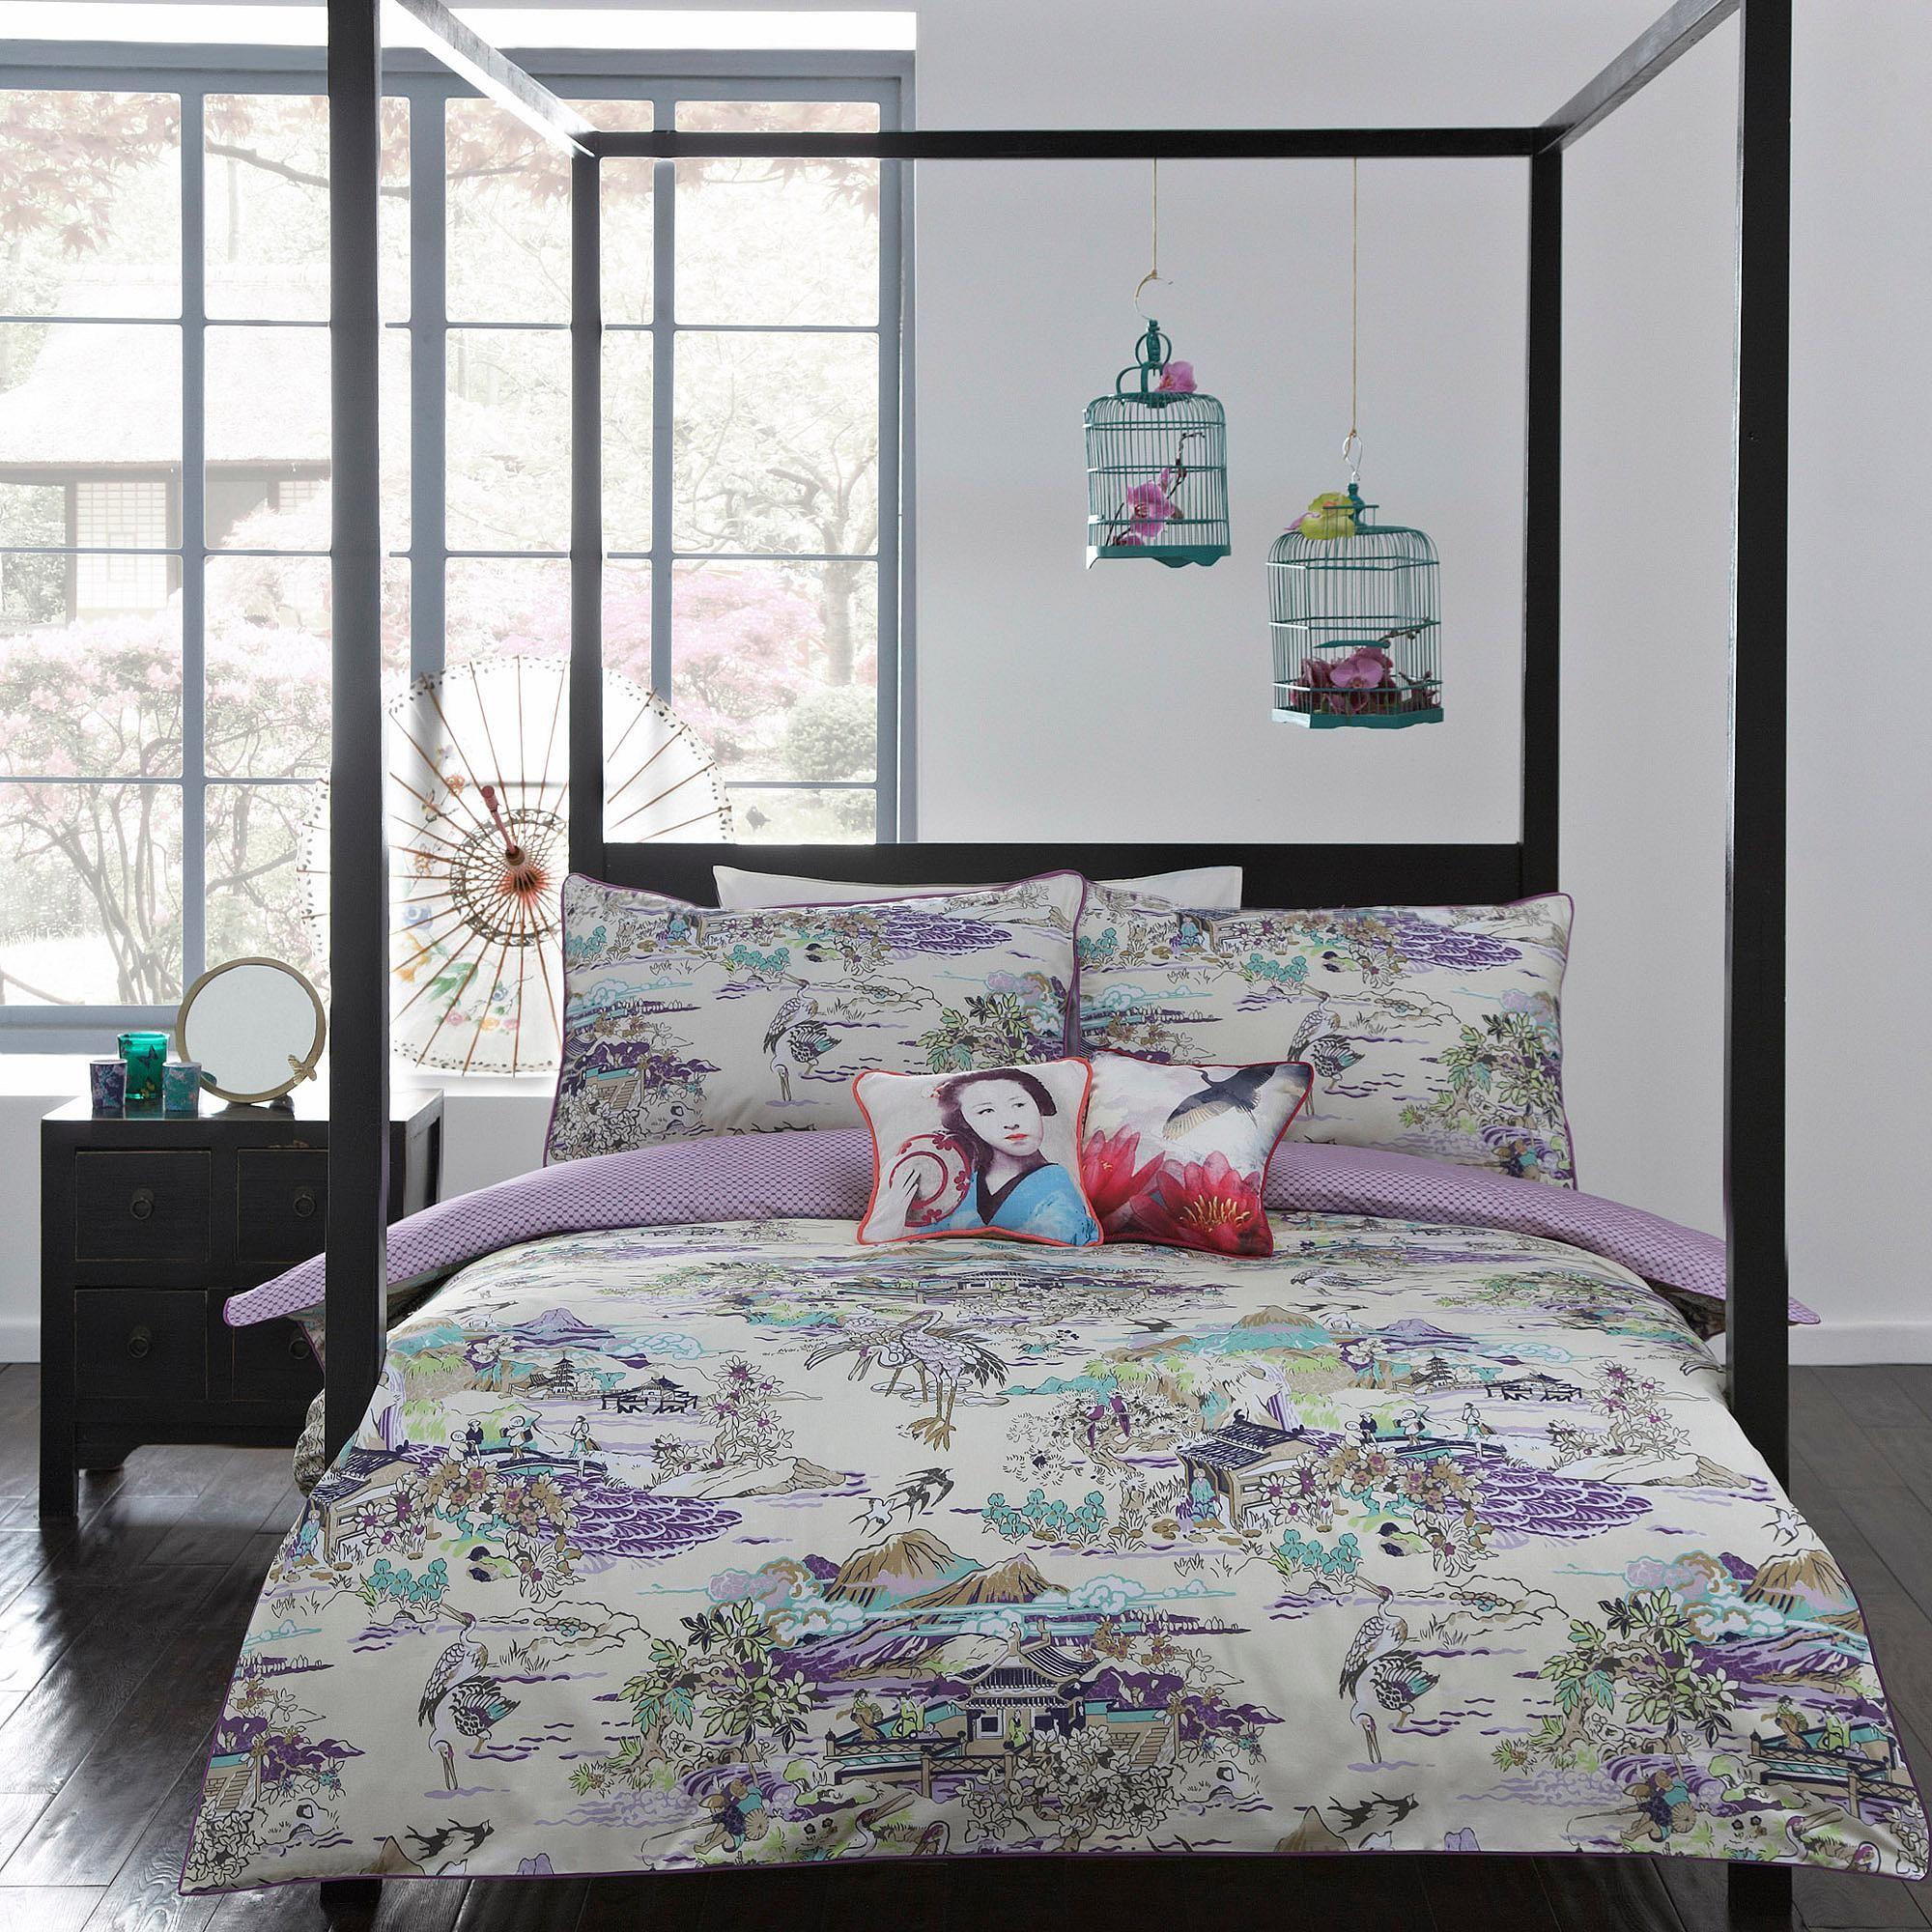 Ivory/purple 'Japanese Toile' bedding set Duvet covers